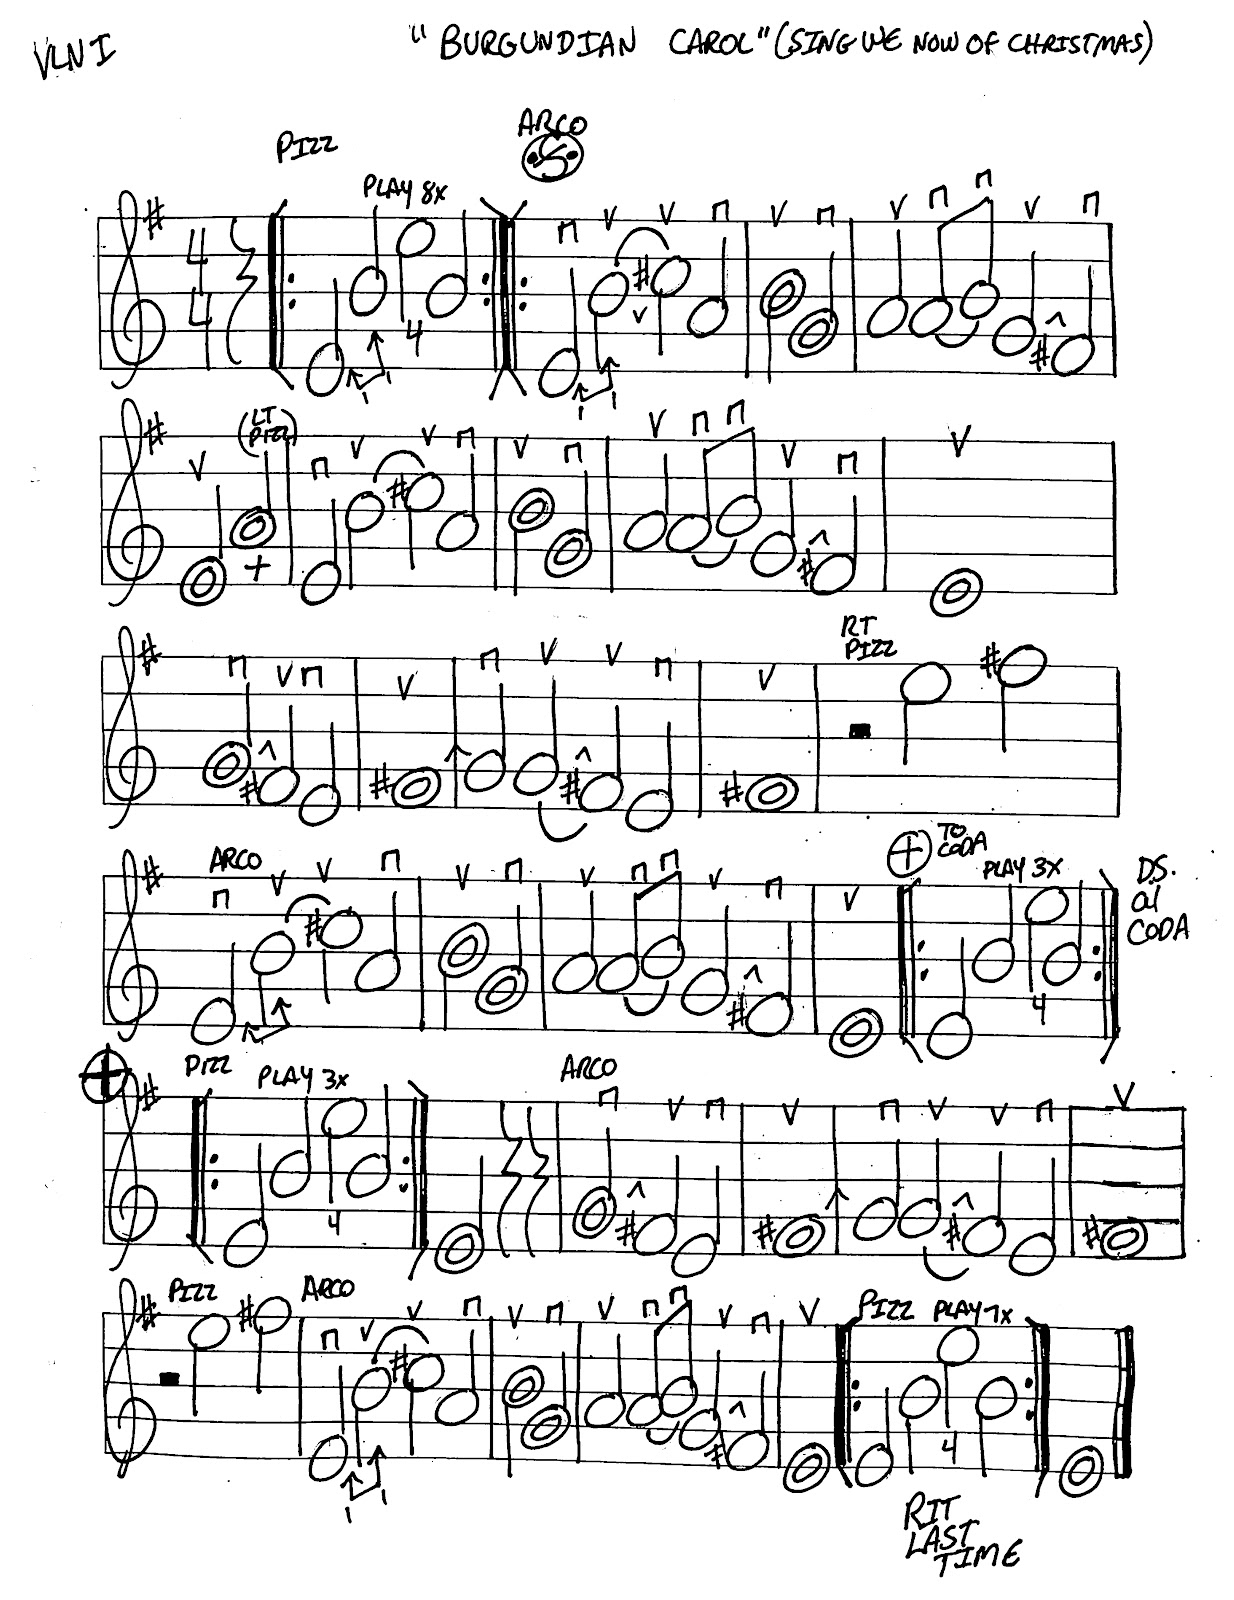 Miss Jacobson S Music Burgundian Carol Music Worksheets